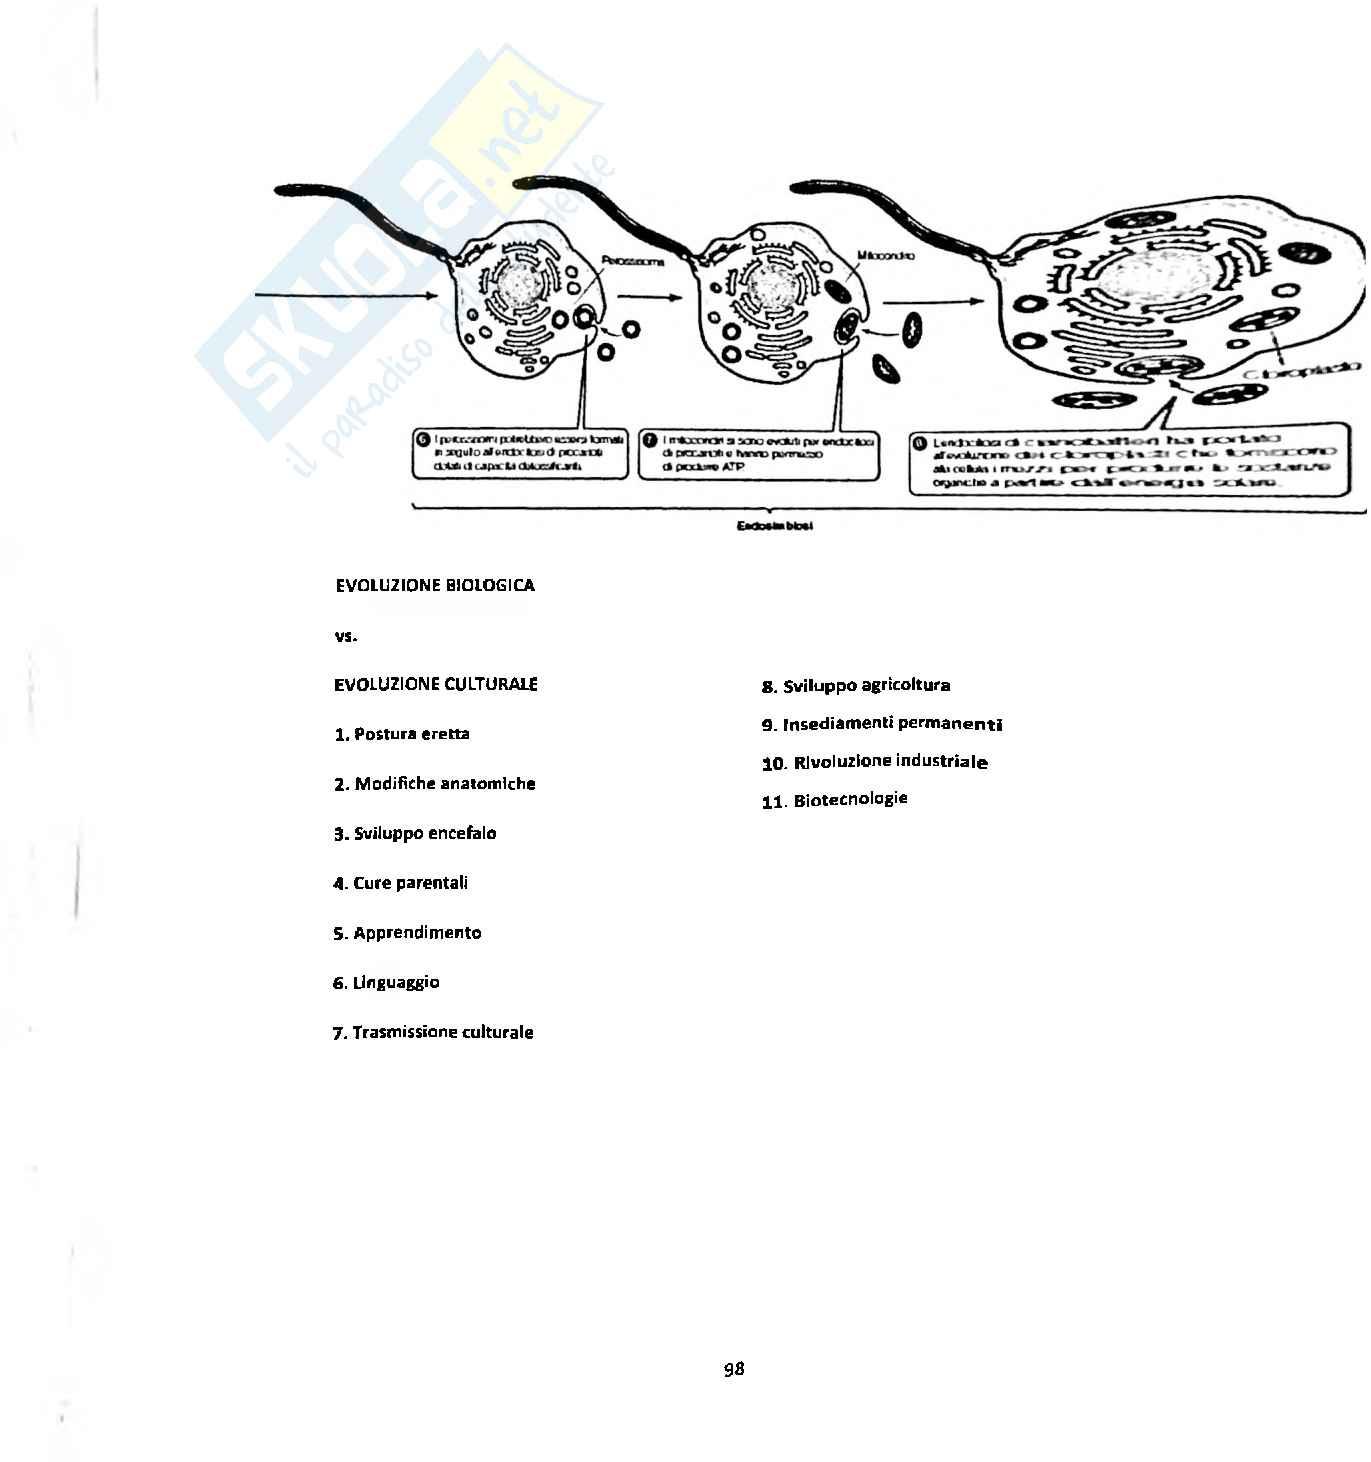 Biologia Animale Pag. 96